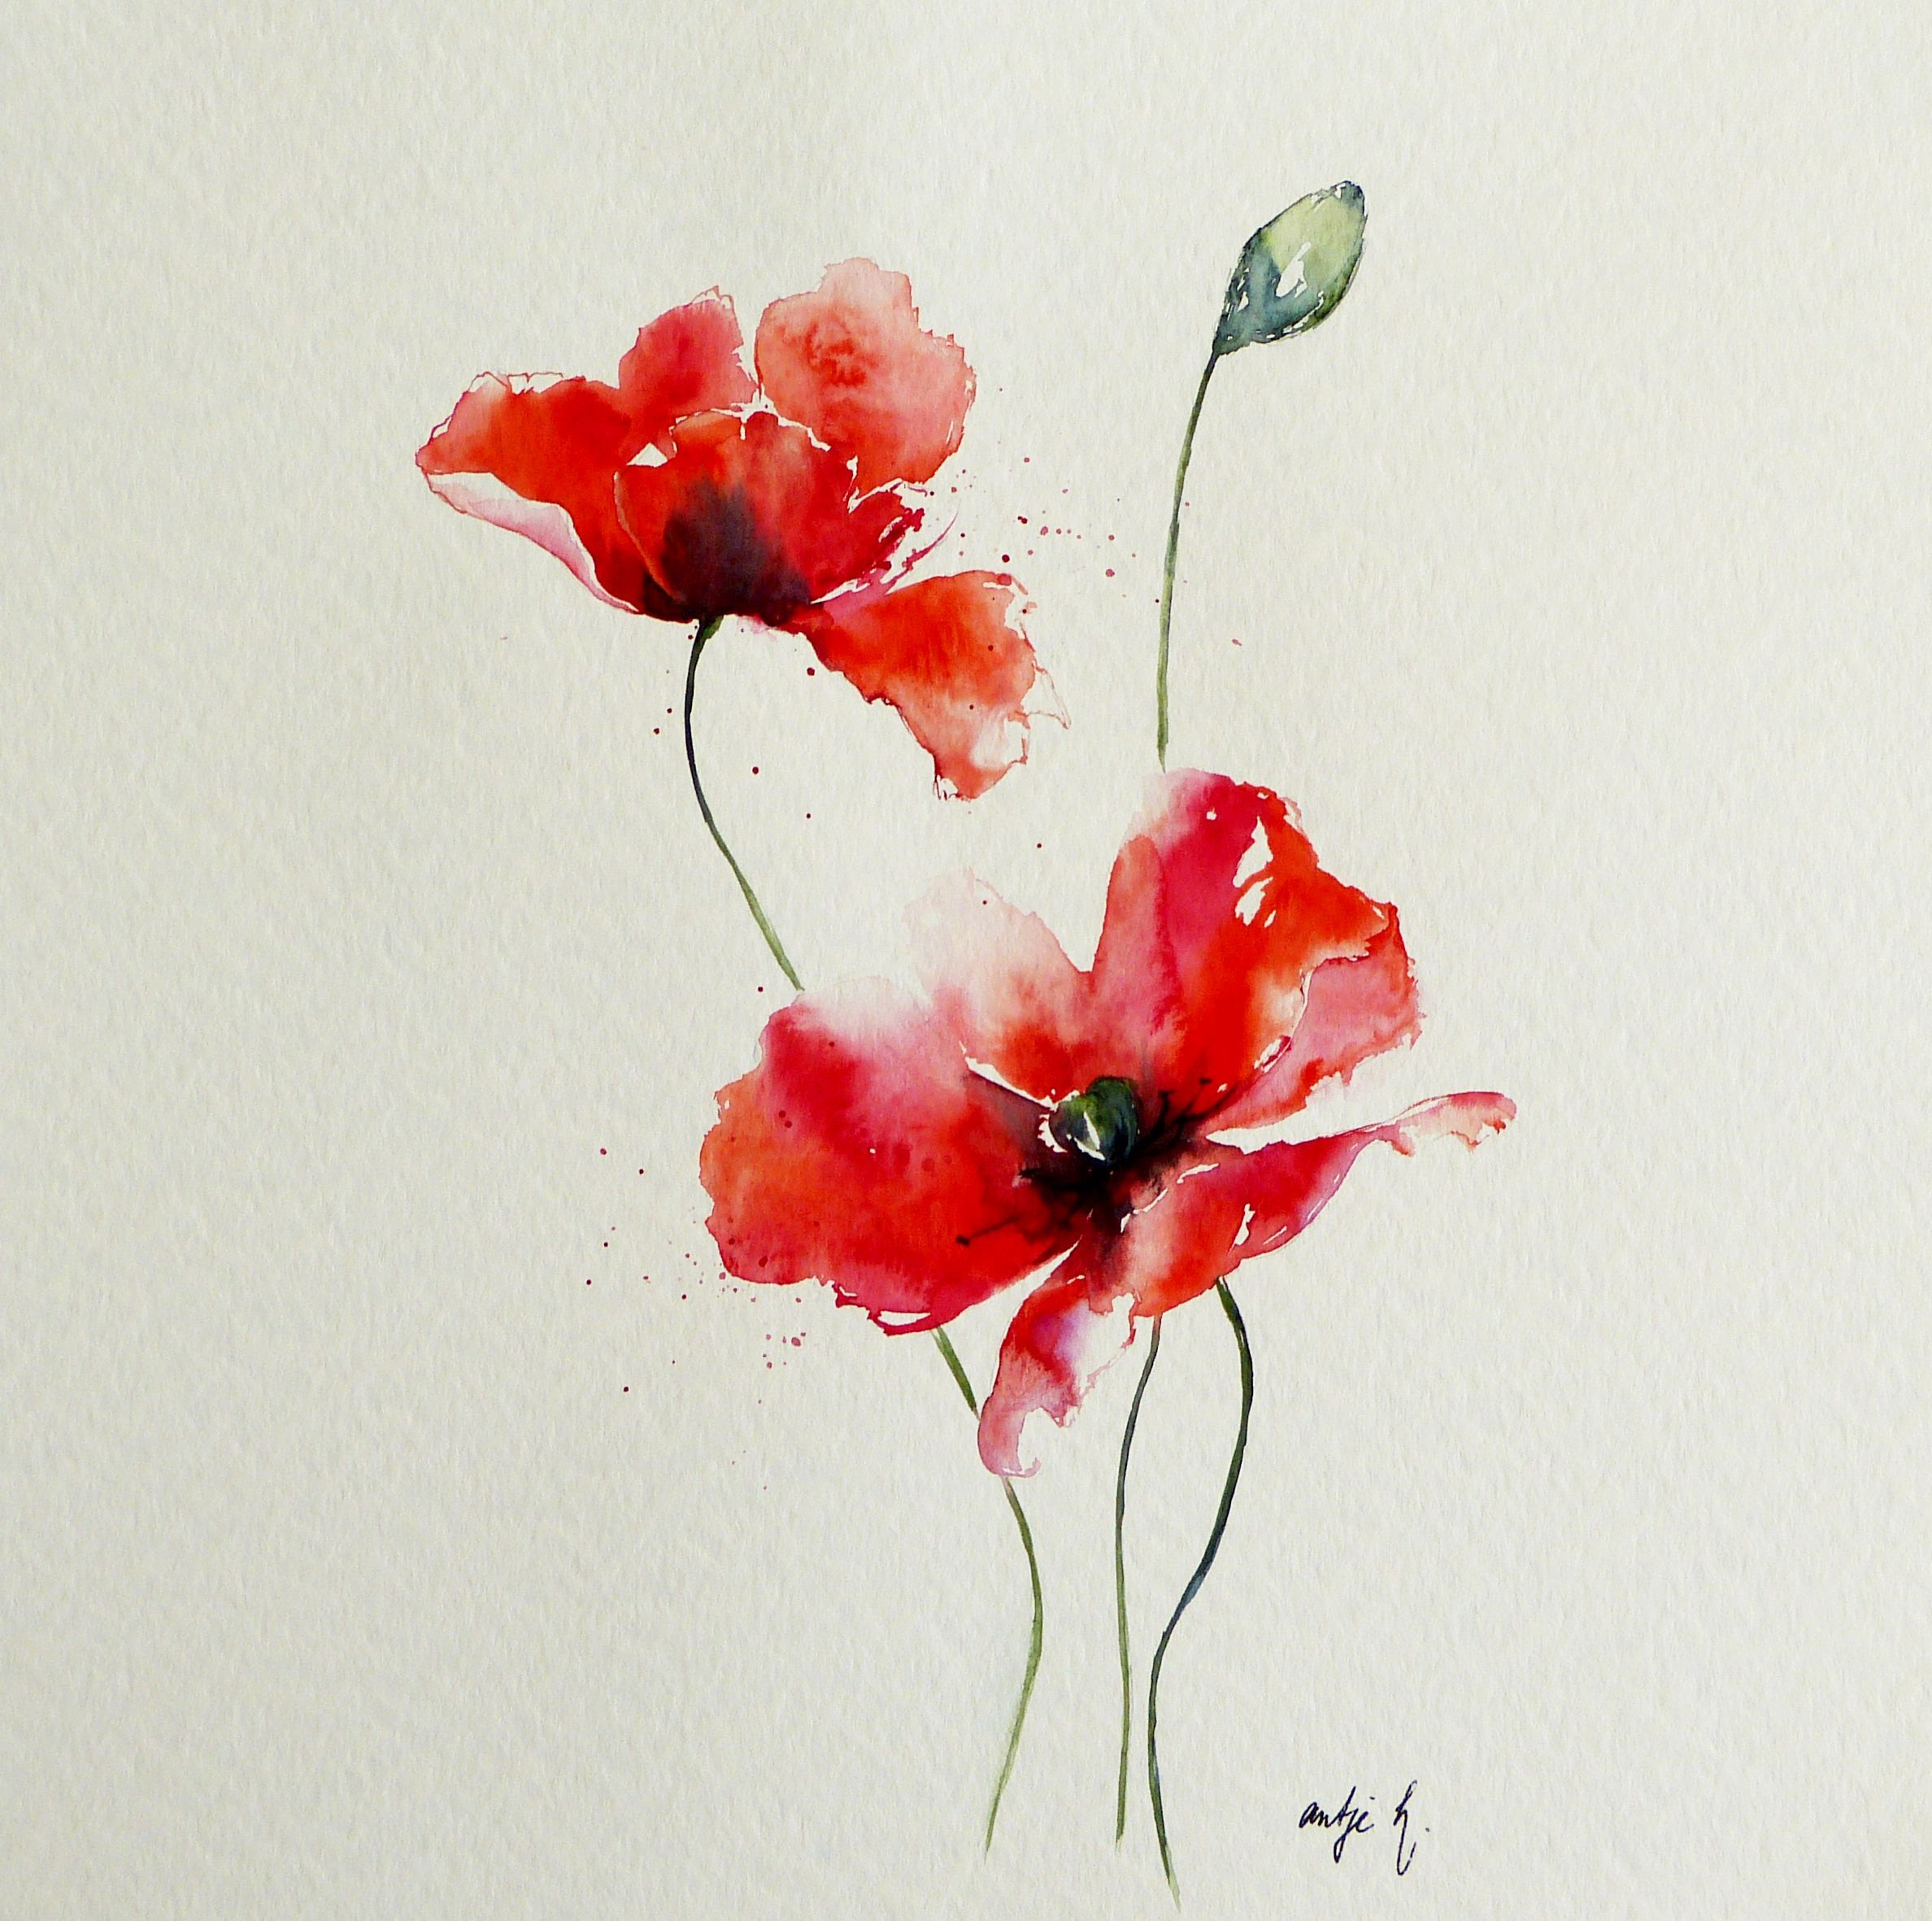 Mohnkomposition Ii Watercolor 40 40 Antje Hettner Aquarell